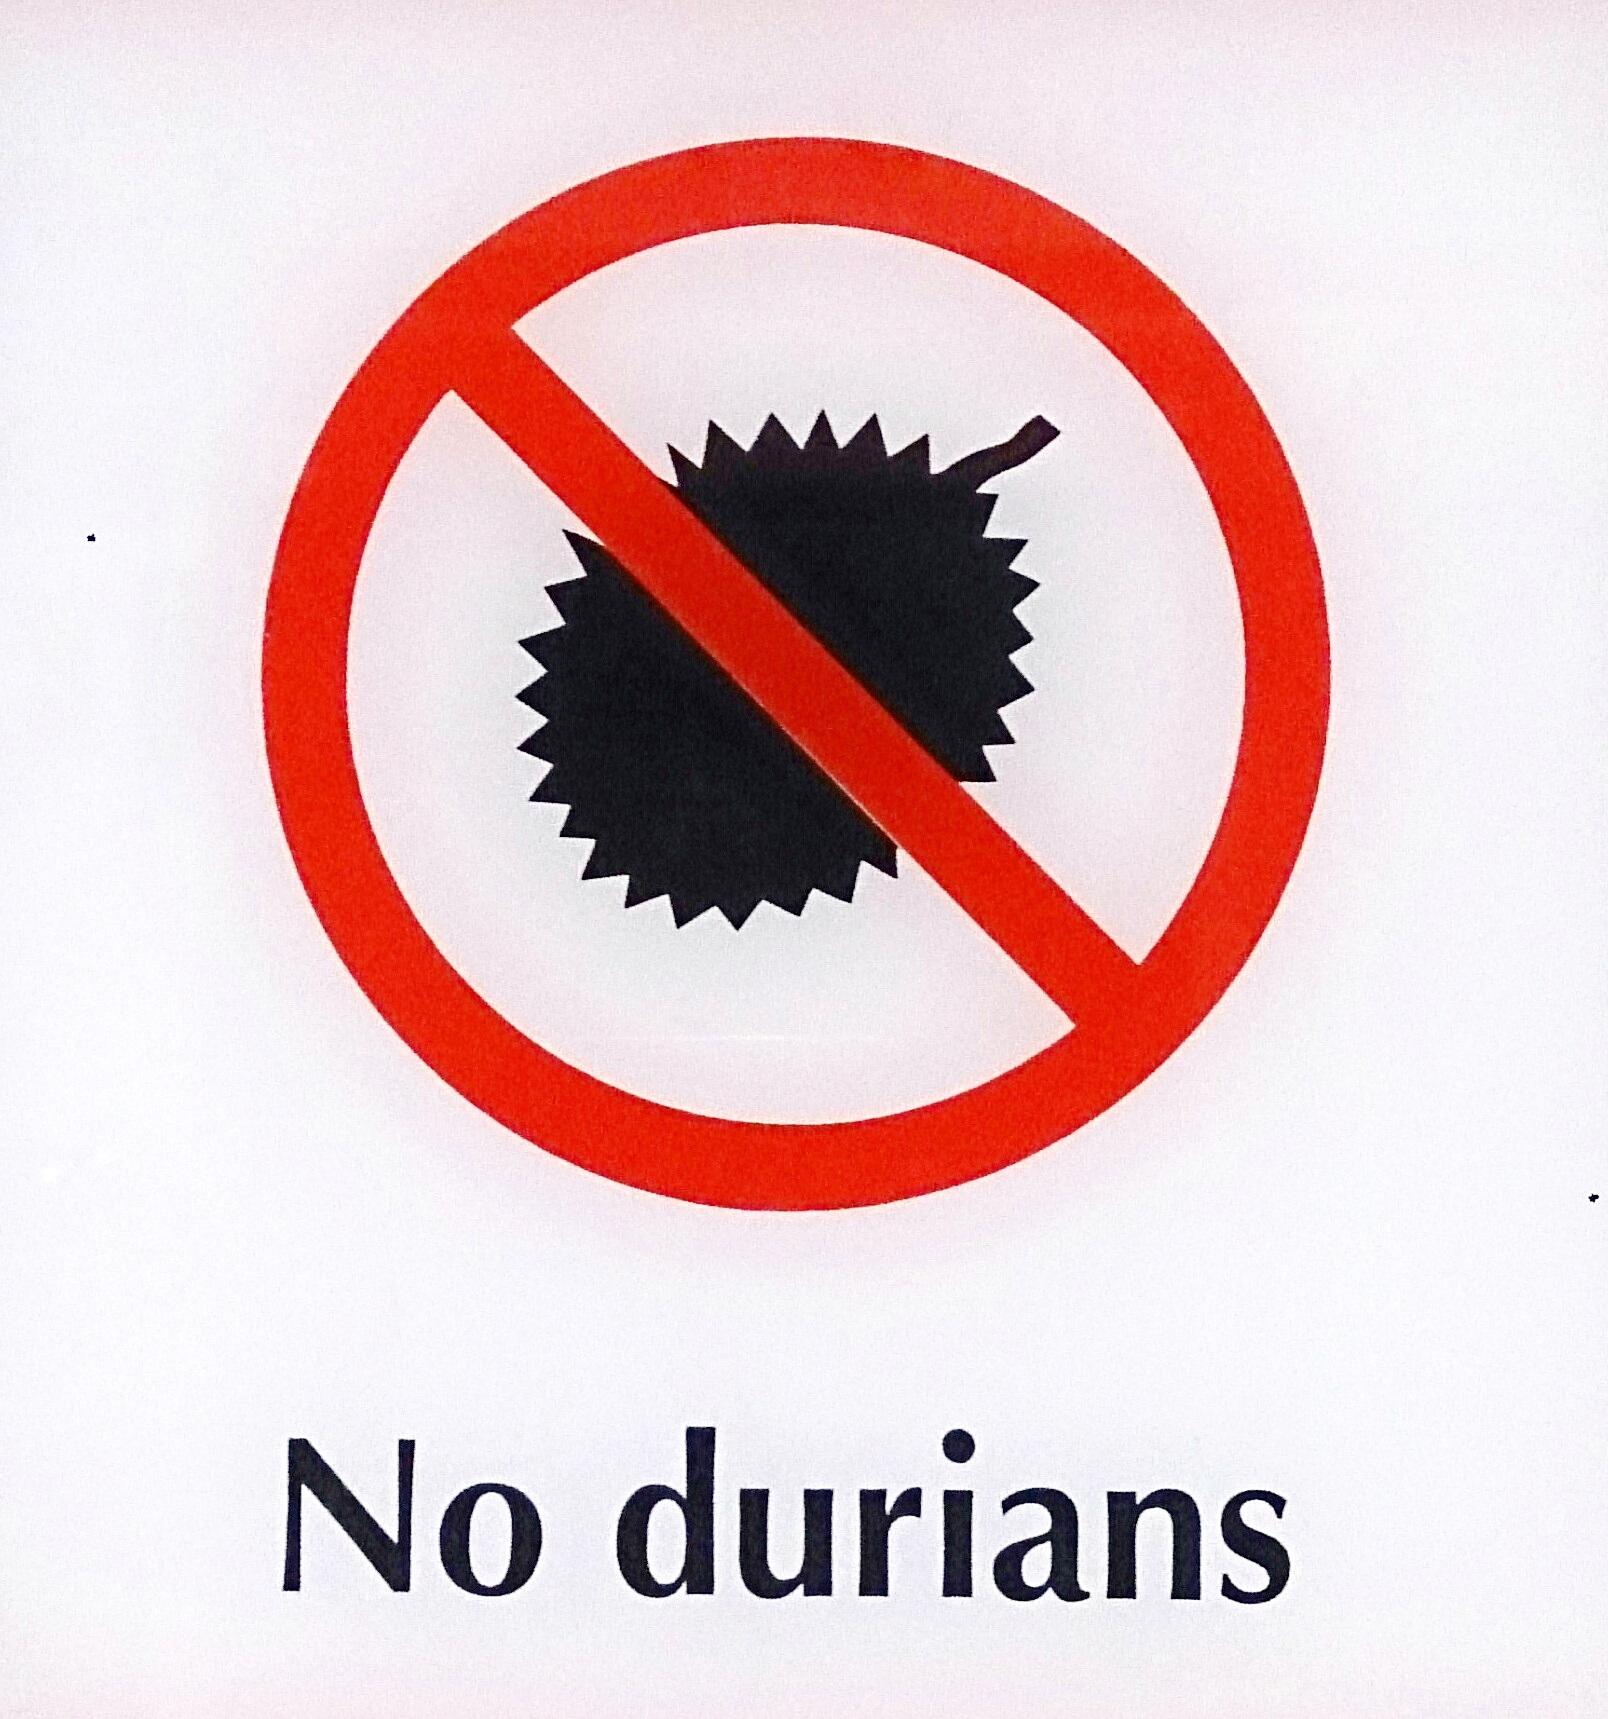 File:No durians sign.j...